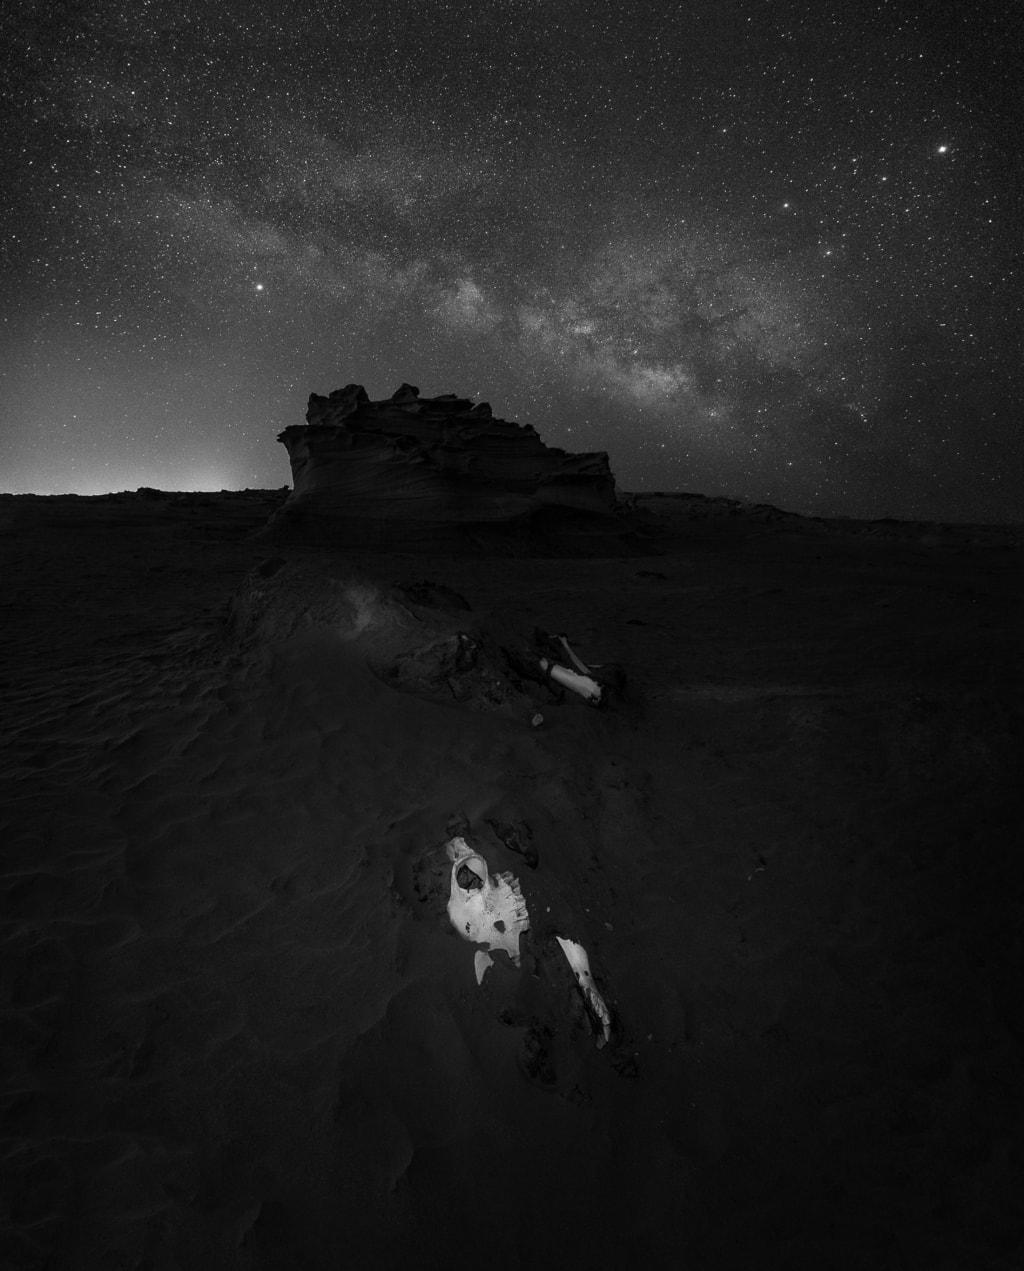 Corpse & Sky via Khalid Jamal Abdullah